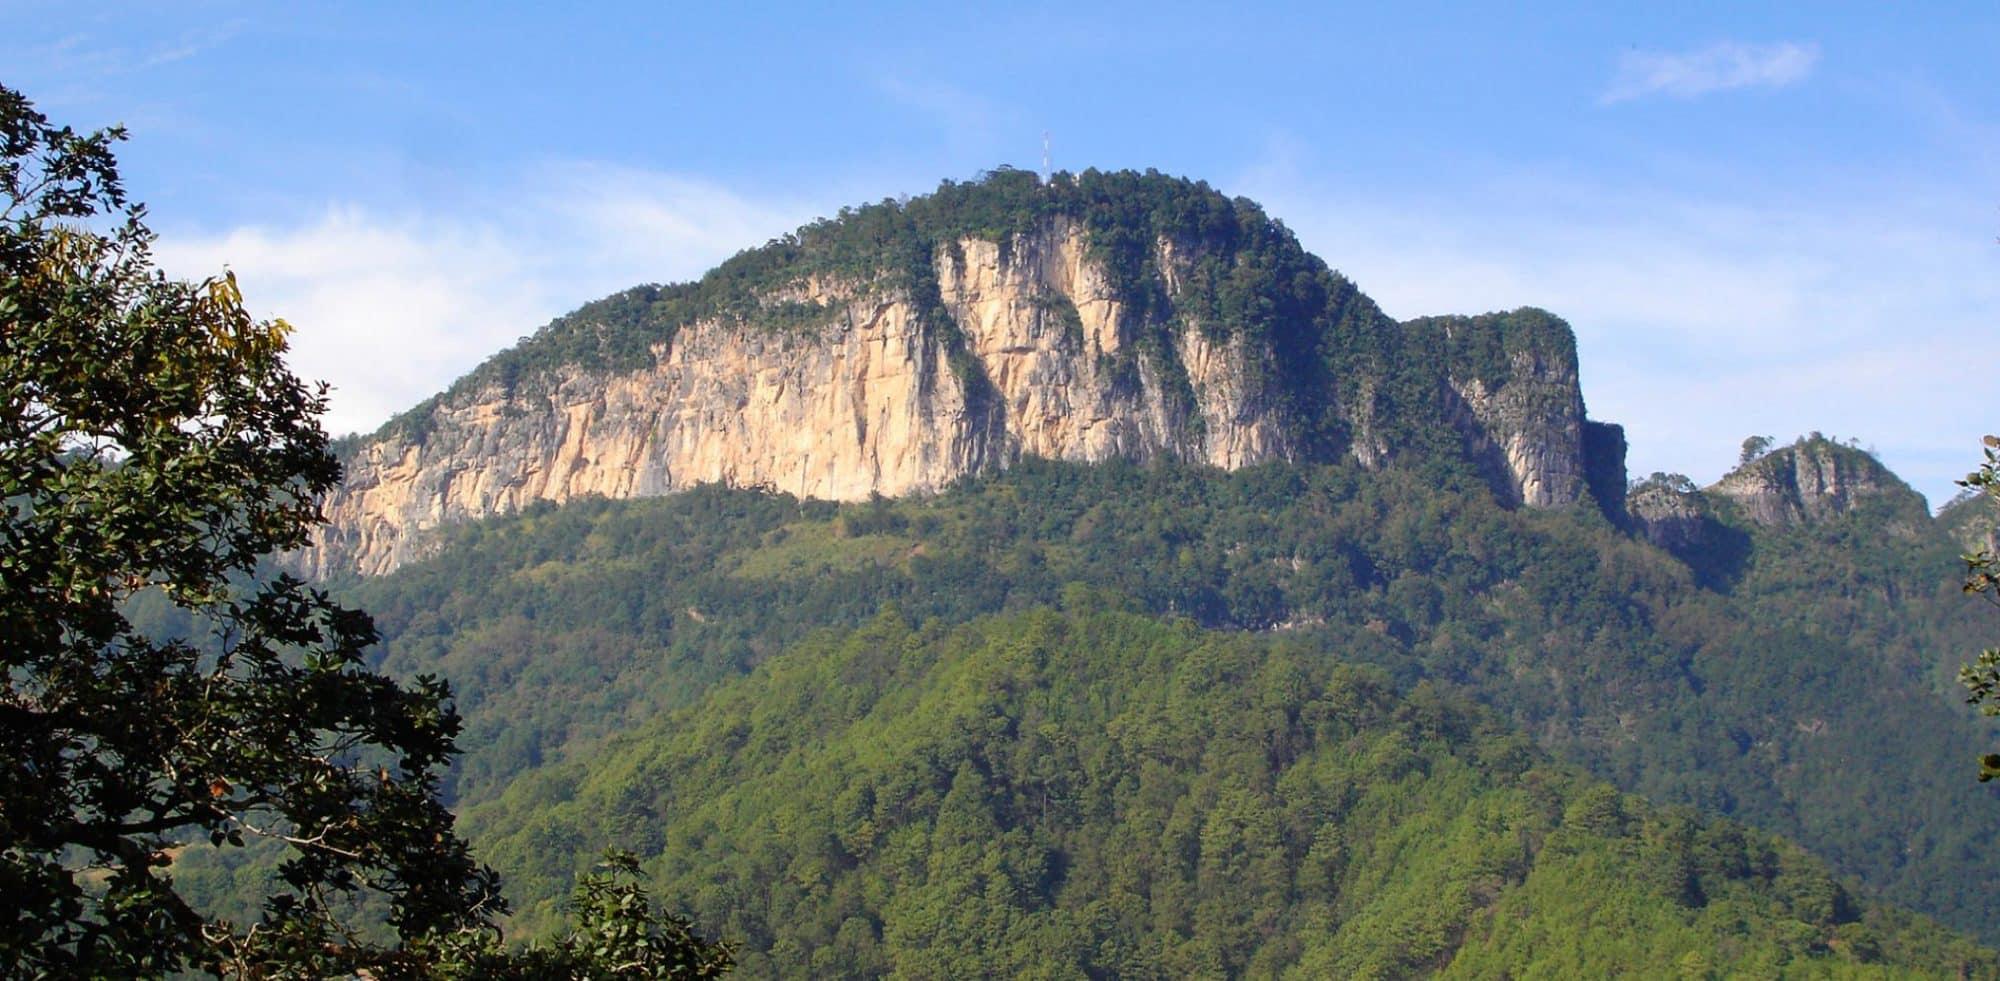 vista del cerro cabezon